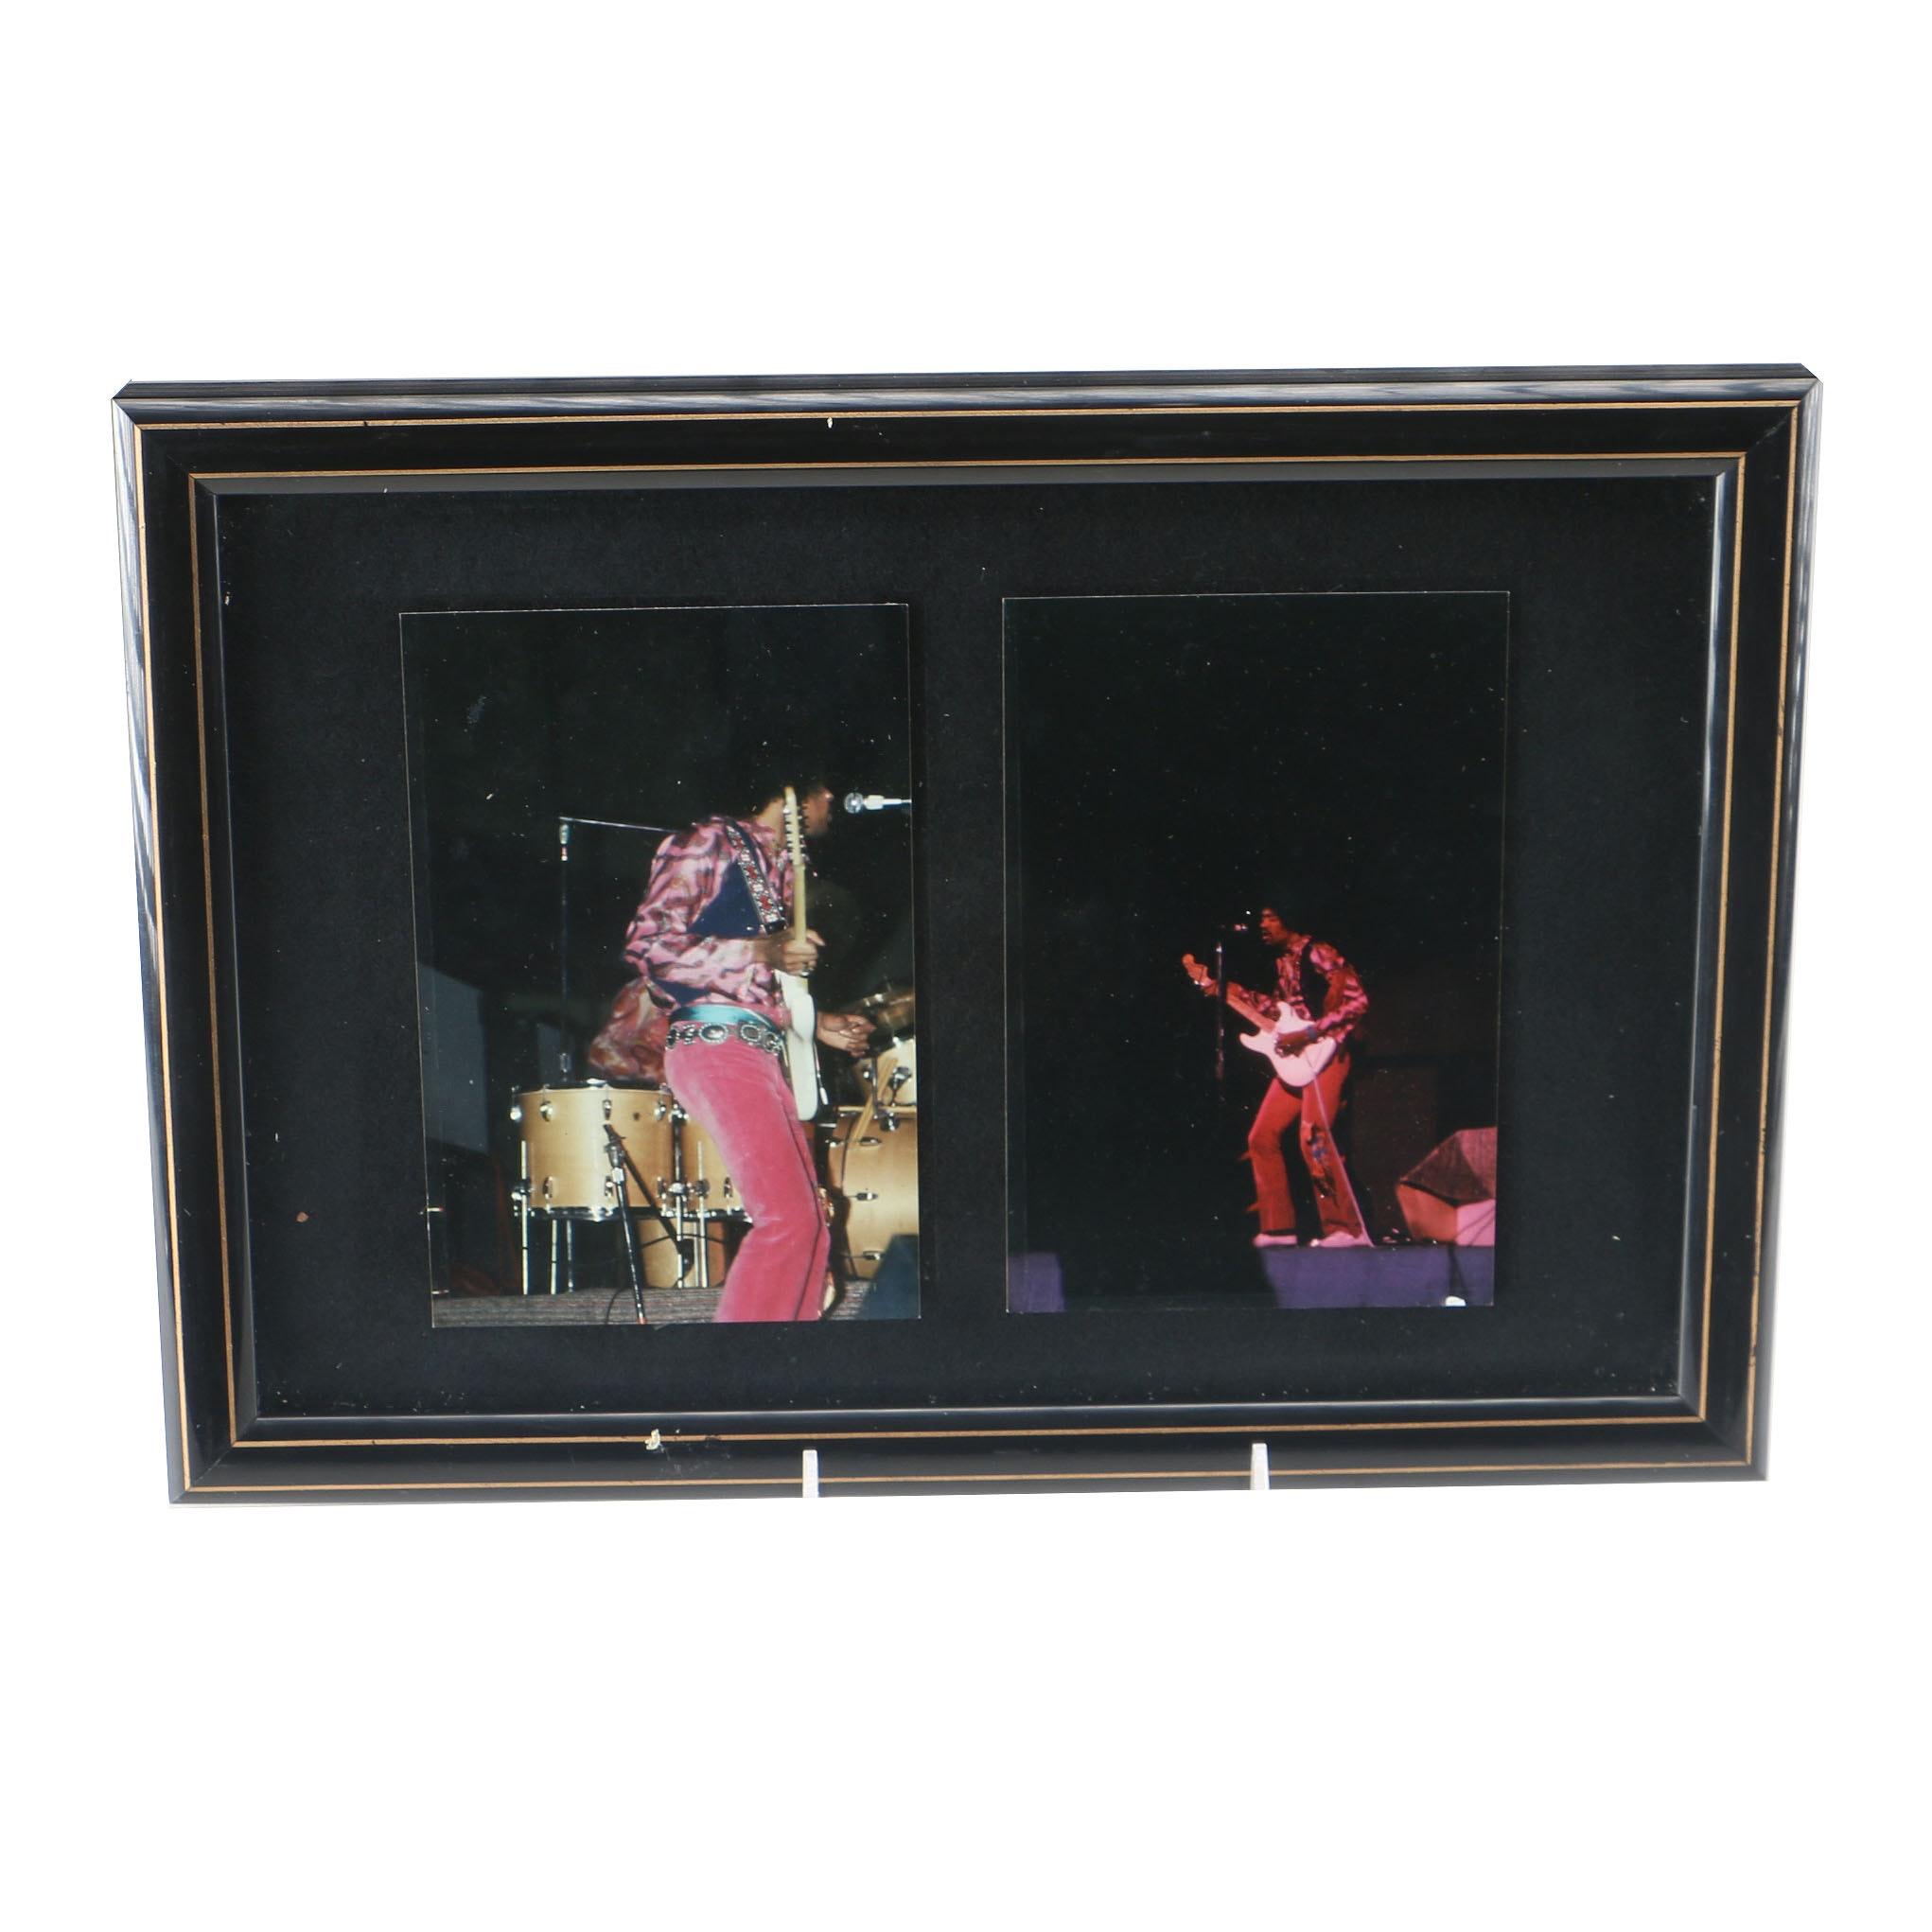 Jimi Hendrix Concert Photos